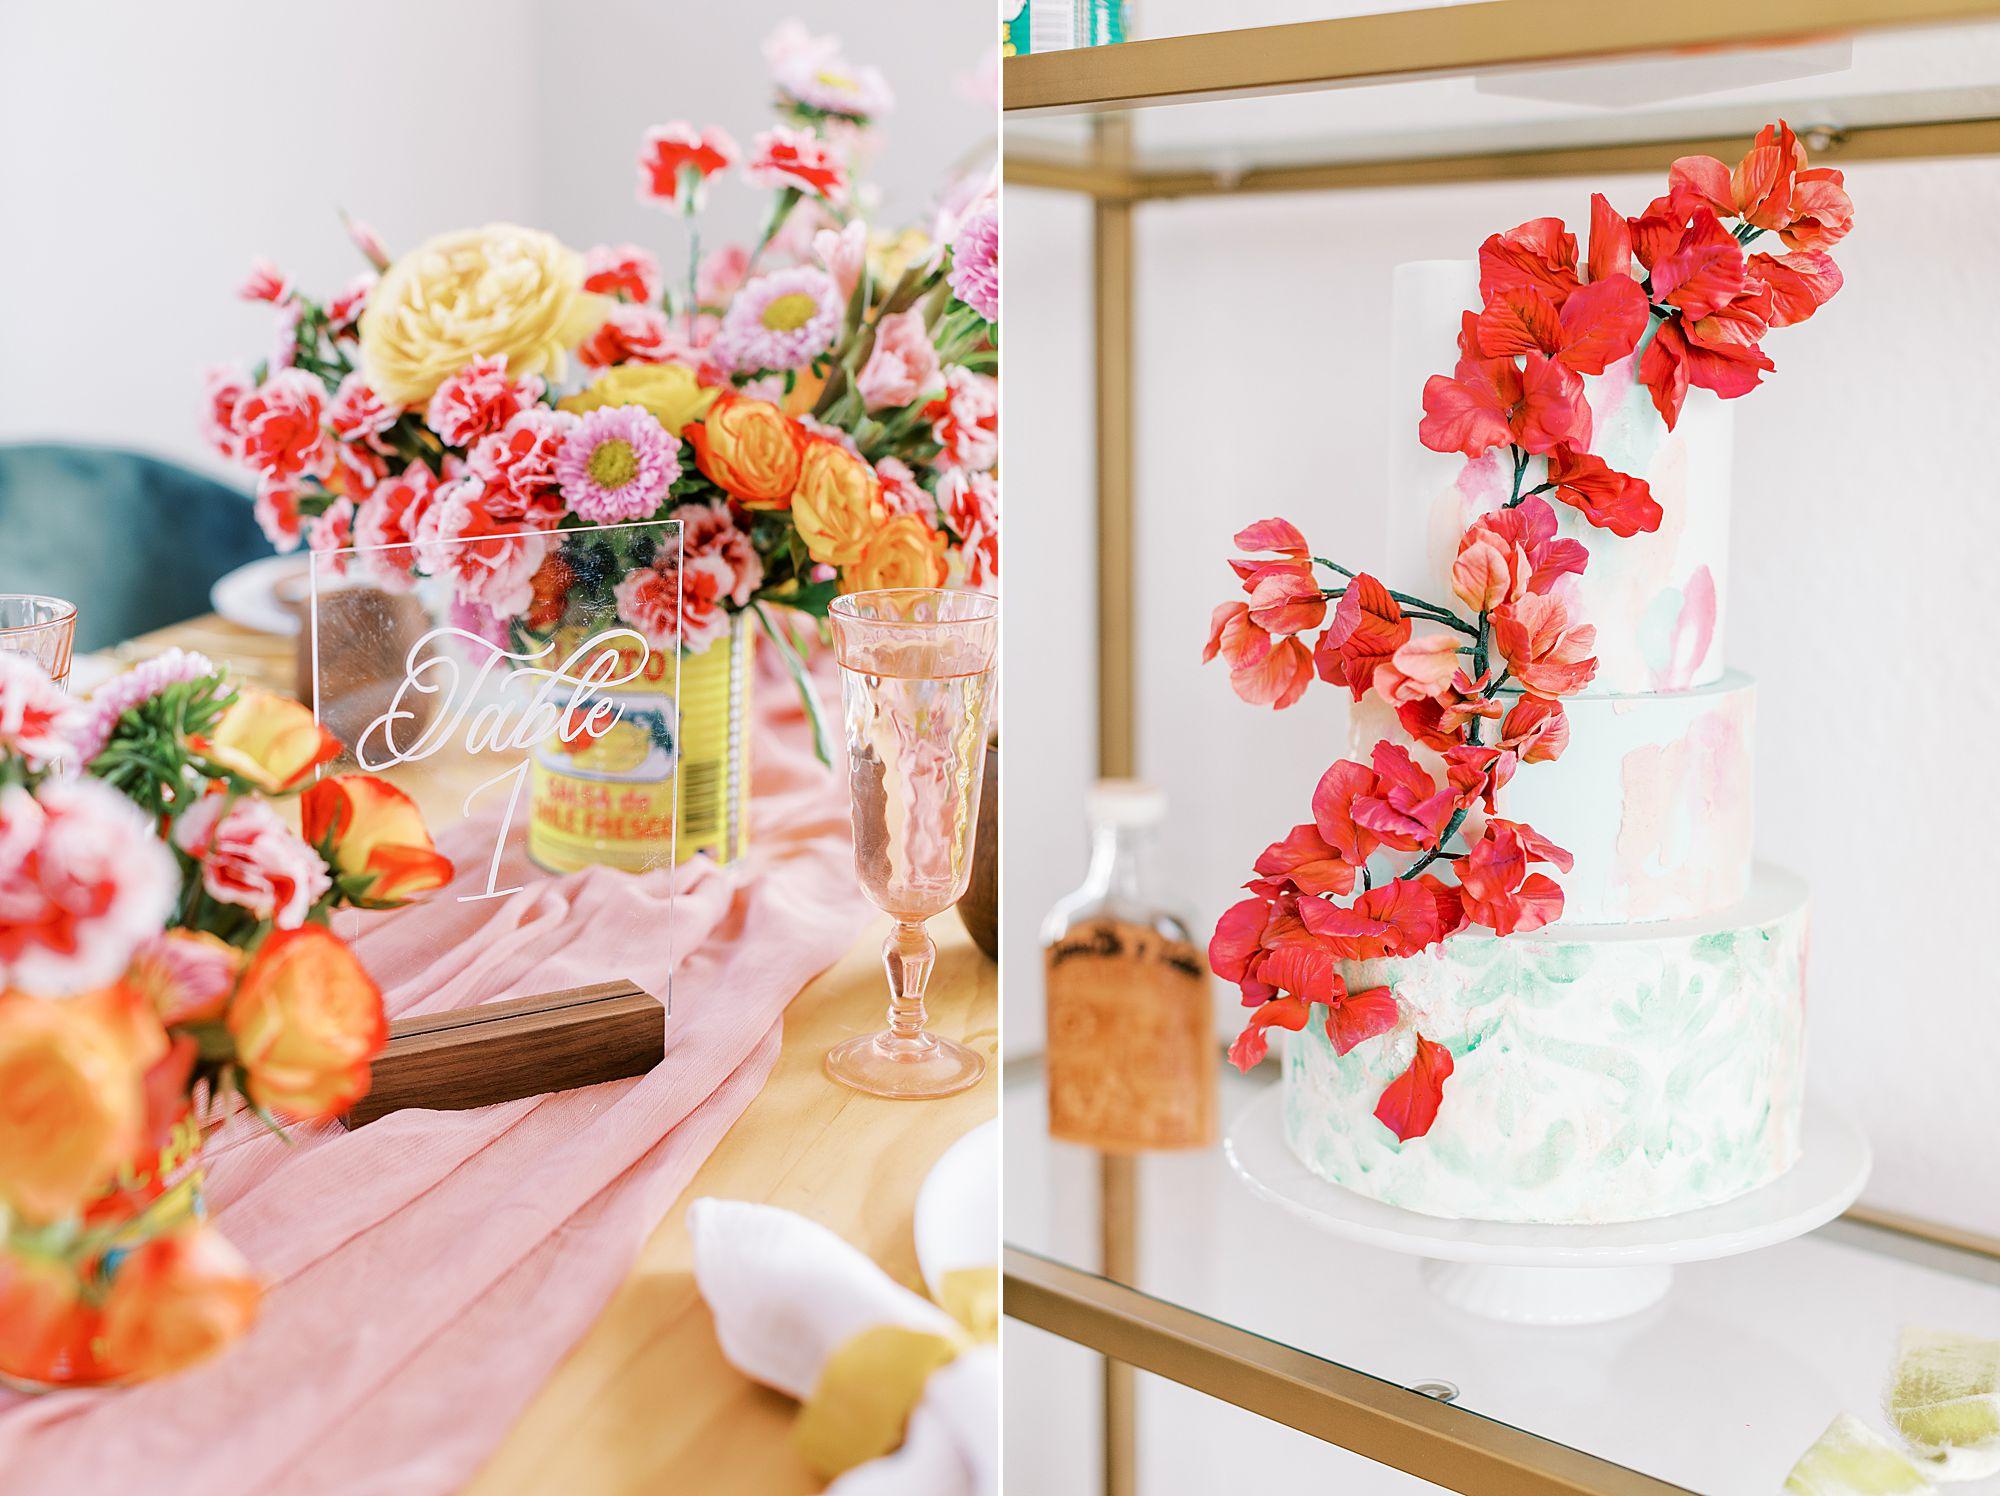 Cinco De Mayo Inspiration for Your FIesta - Party Crush Studio and Ashley Baumgartner_0053.jpg